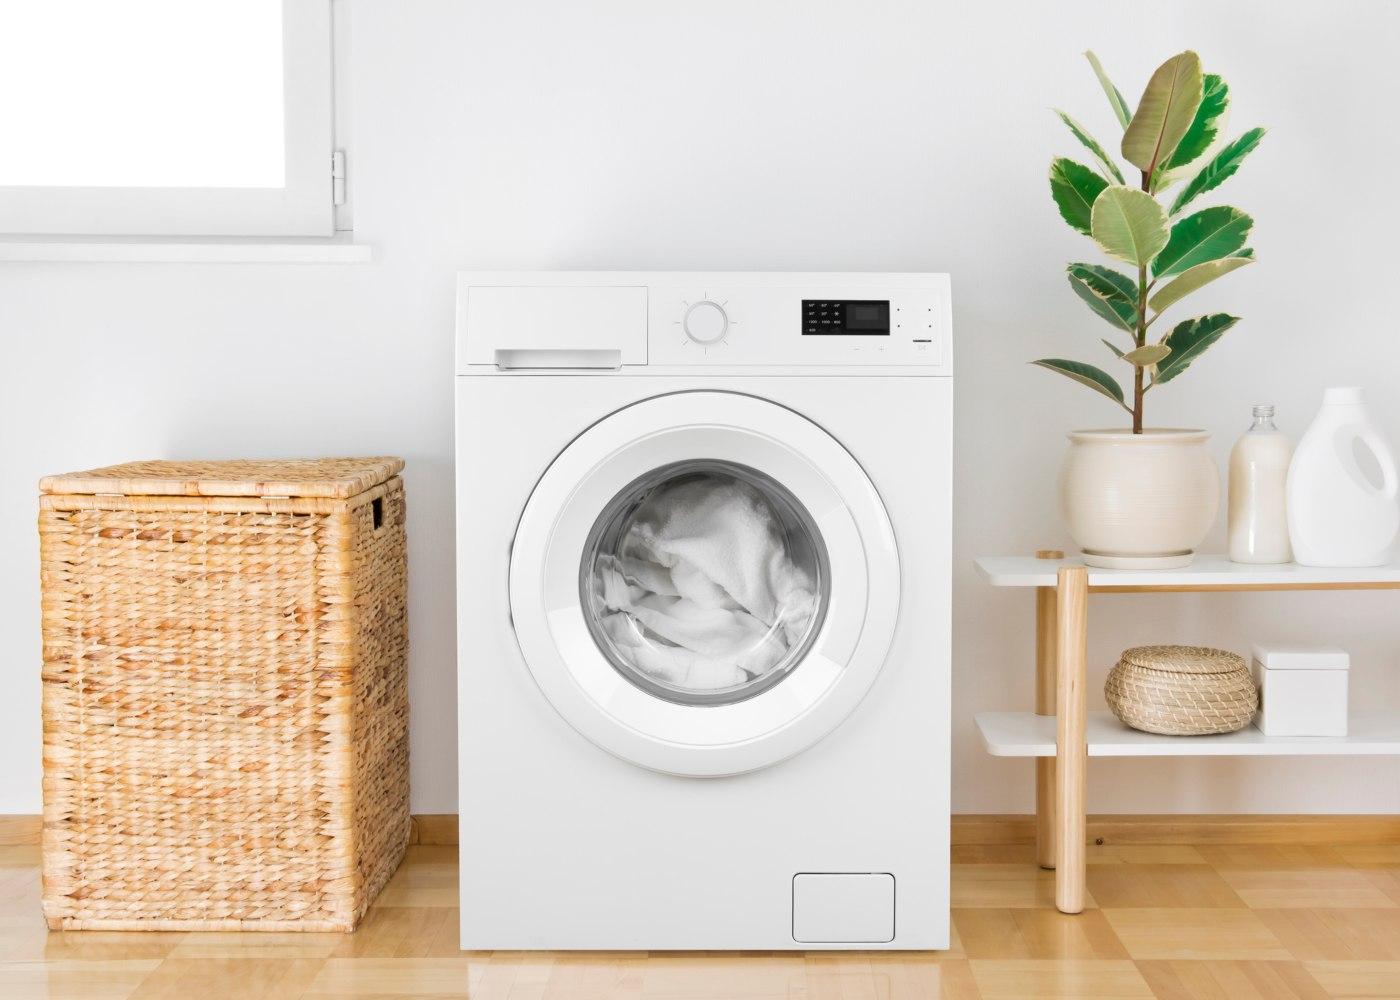 máquina de lavar a roupa